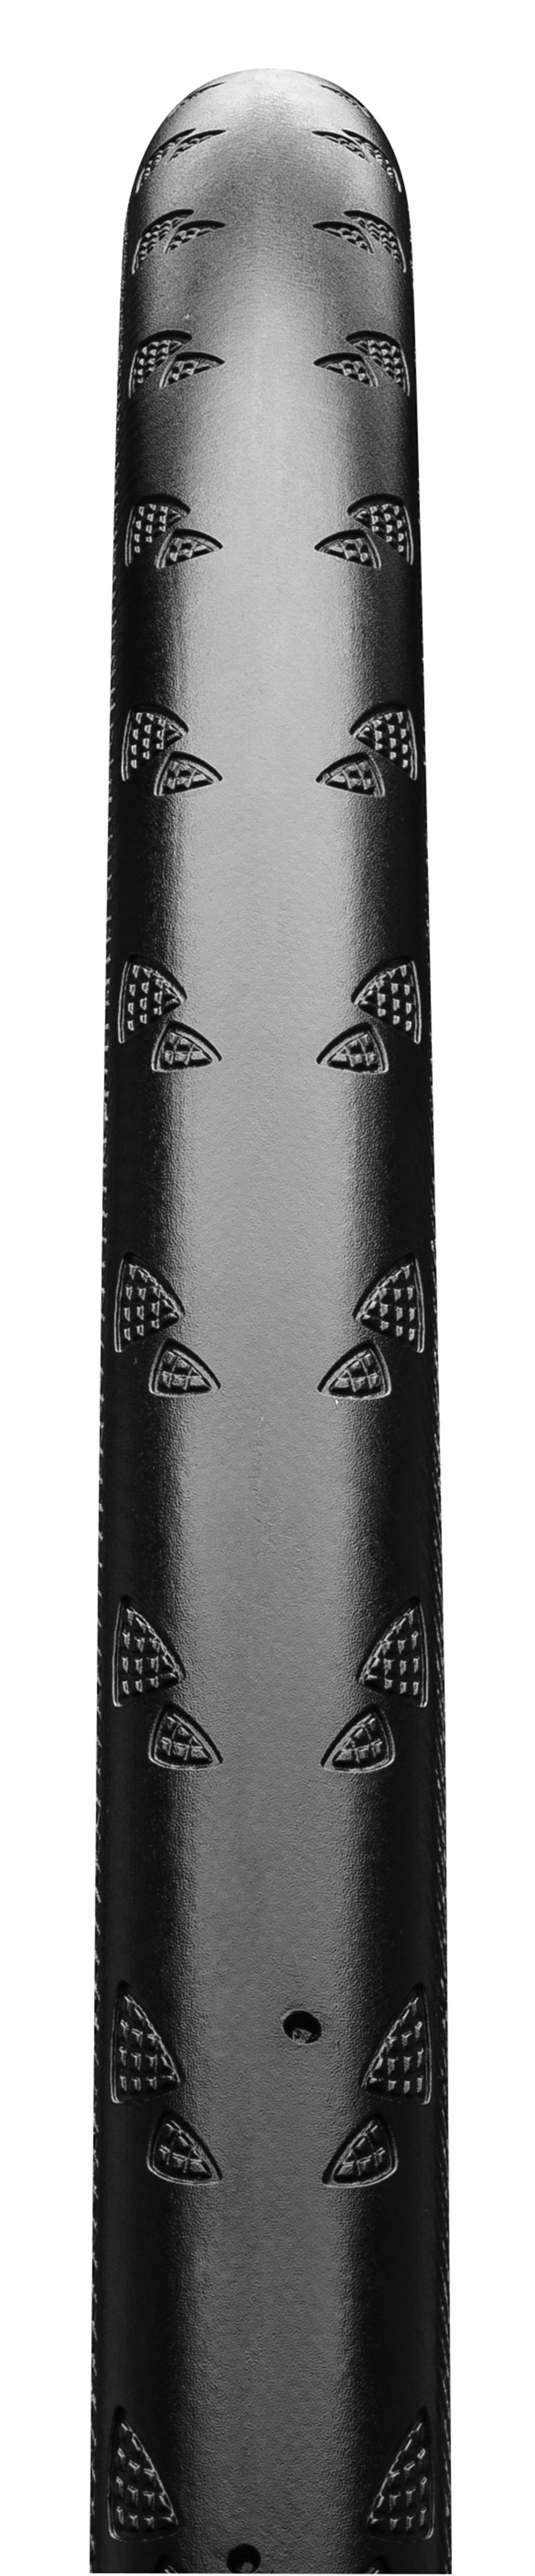 Buitenband Gatorskin Vouwbaar 25-622 / 700x25C -